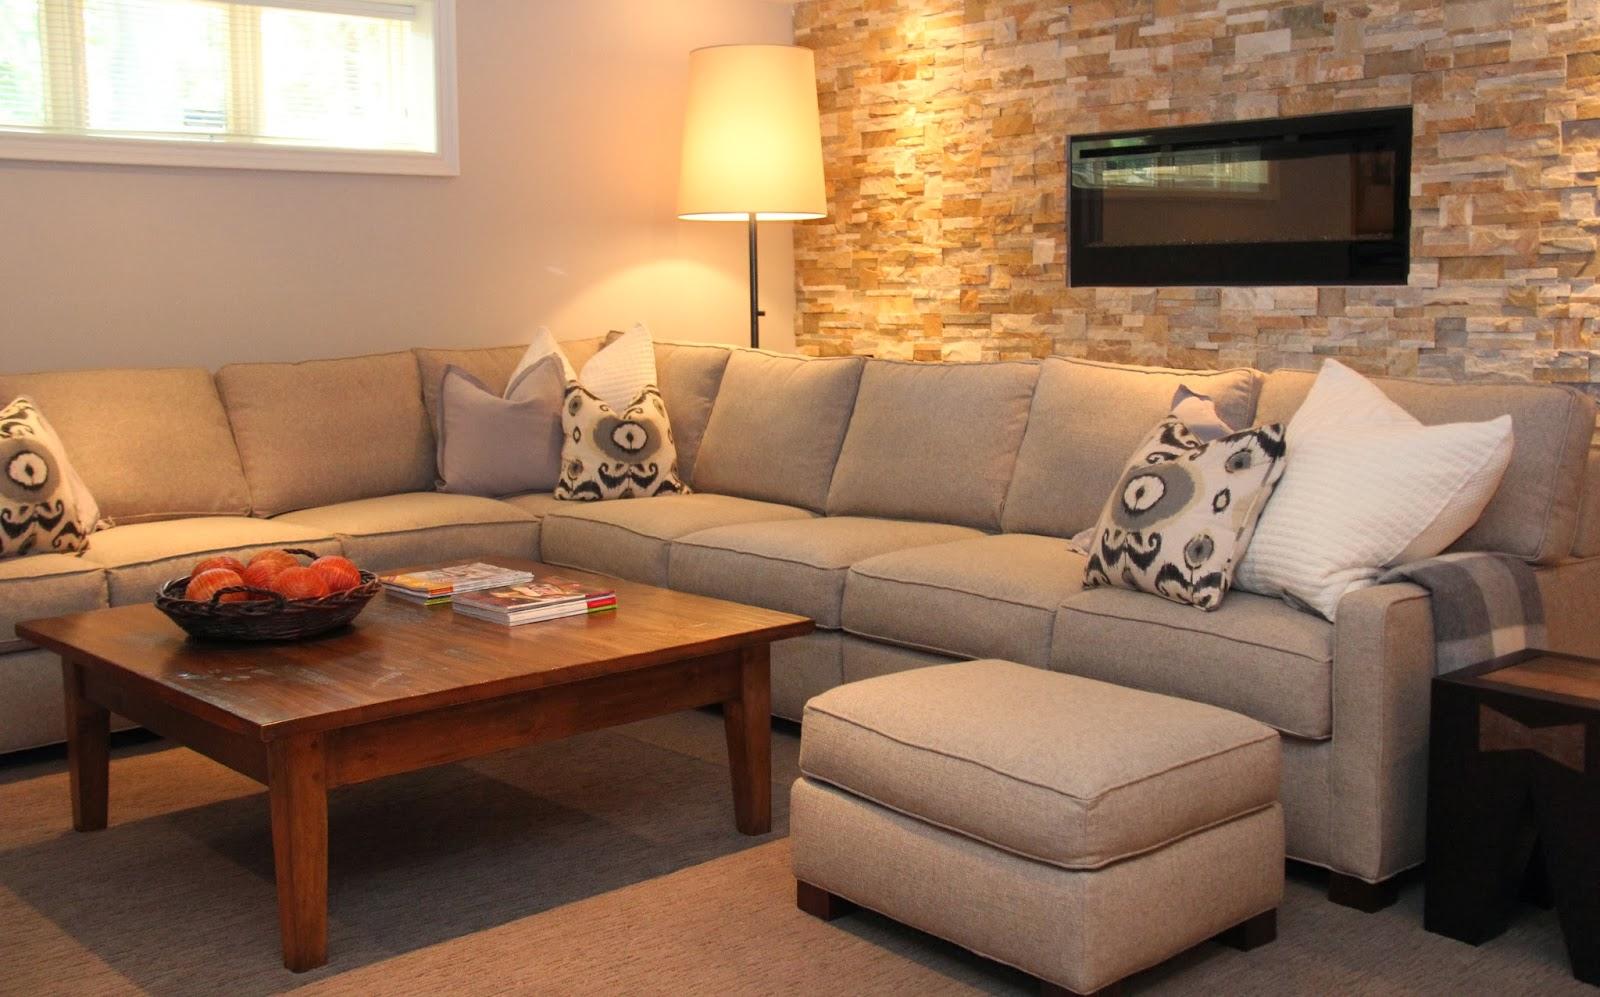 Antony Todd Sofa Corner Cover Uk Rousseau 39s Fine Furniture And Decor Spot The Lee